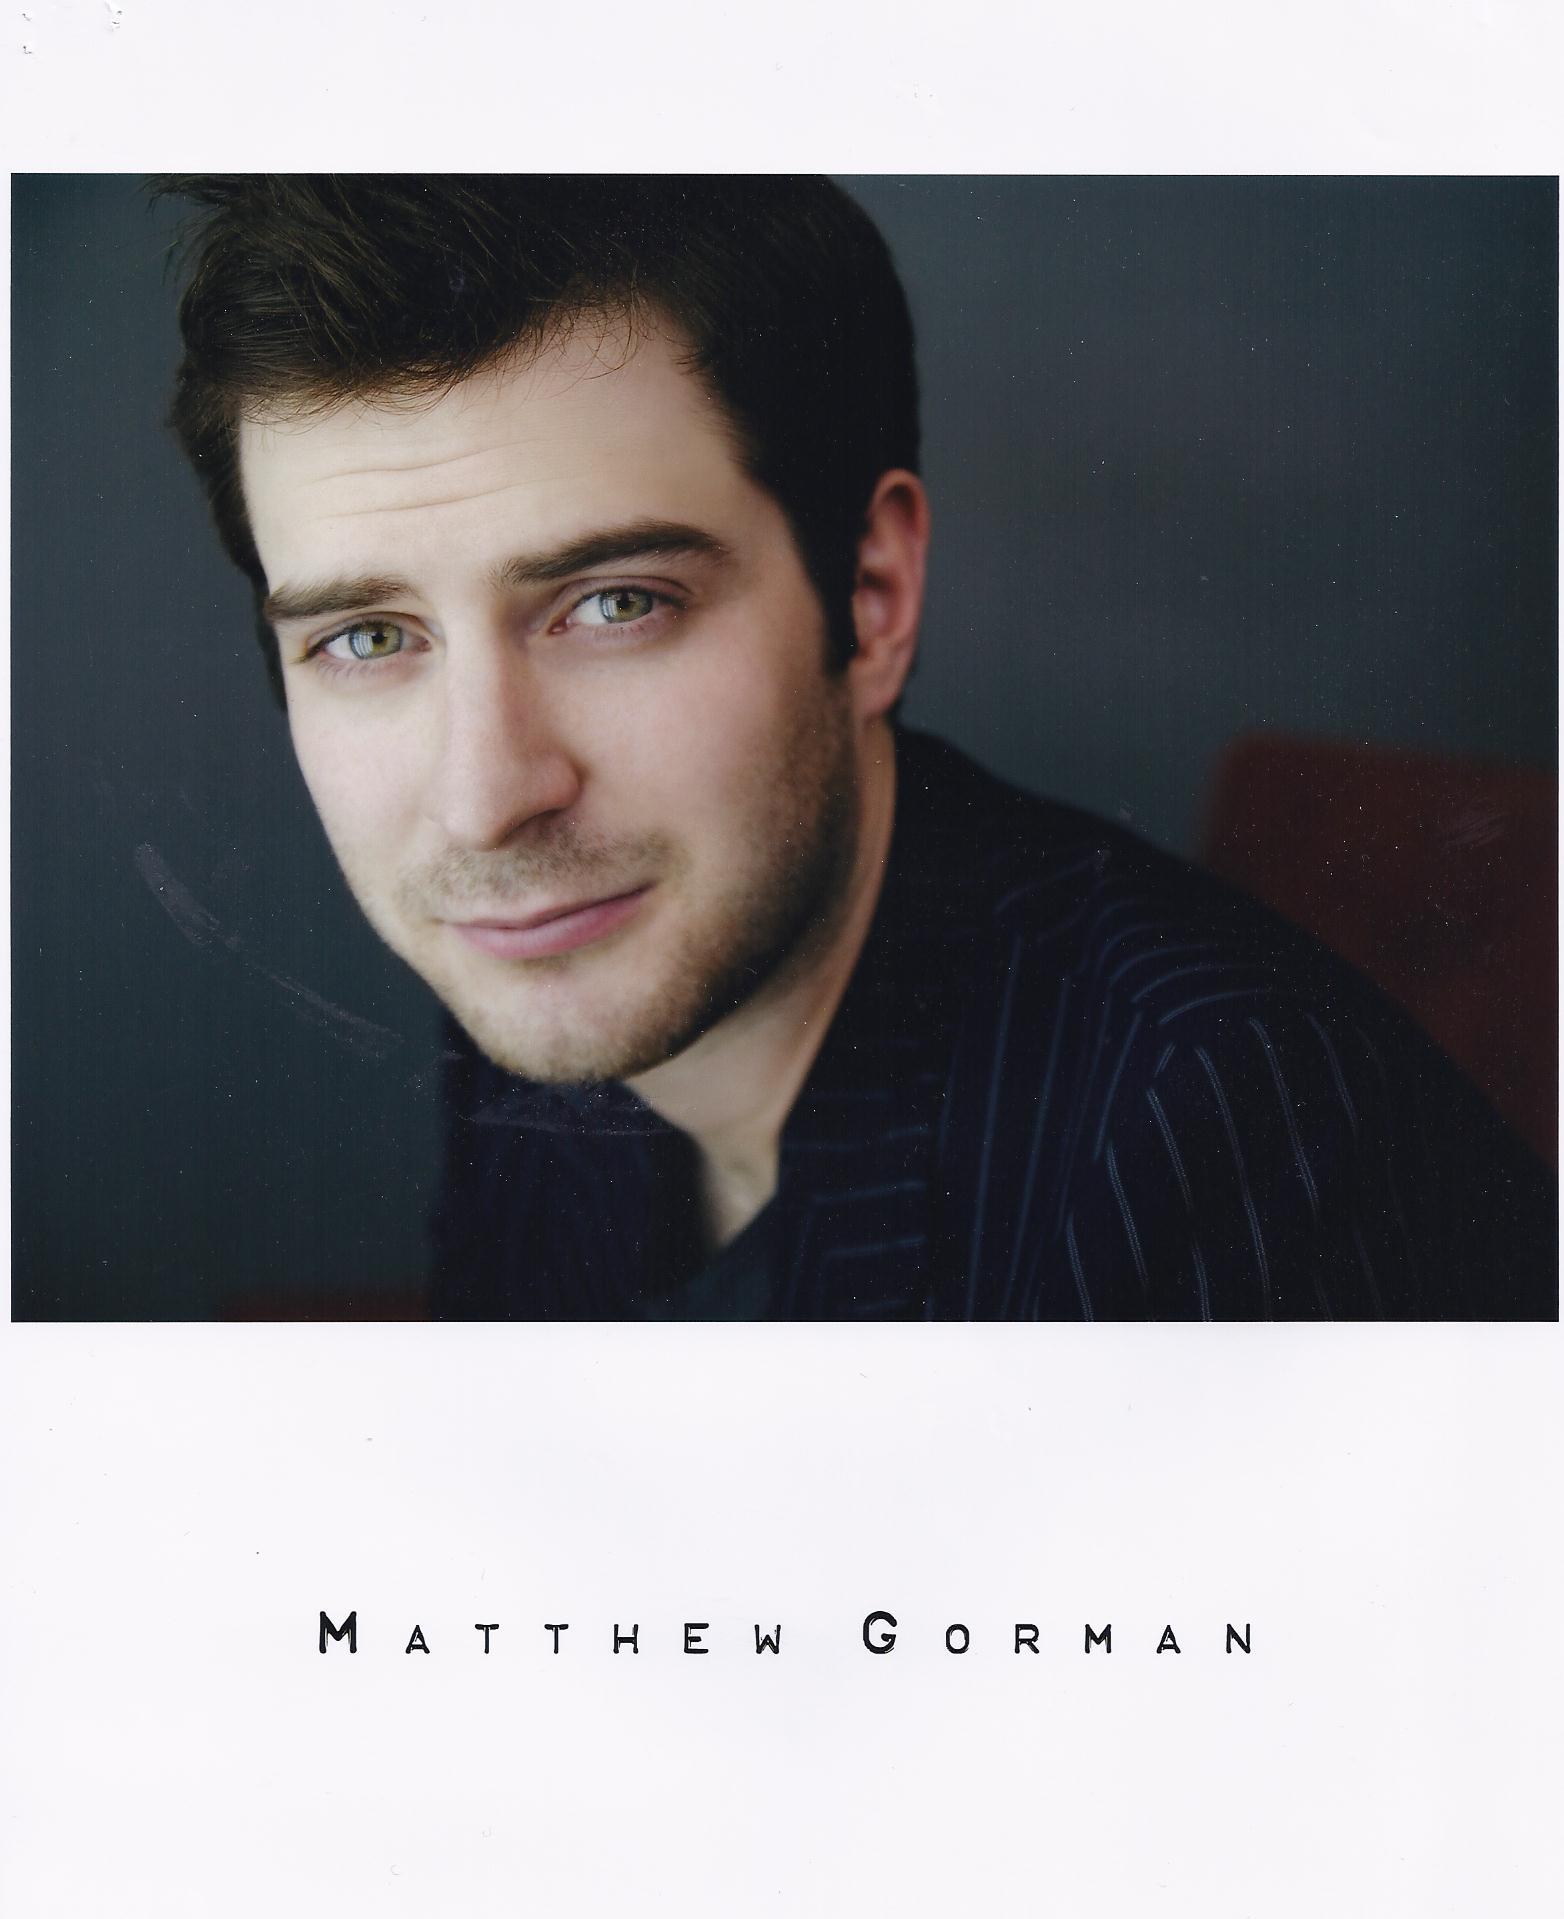 Matthew Gorman